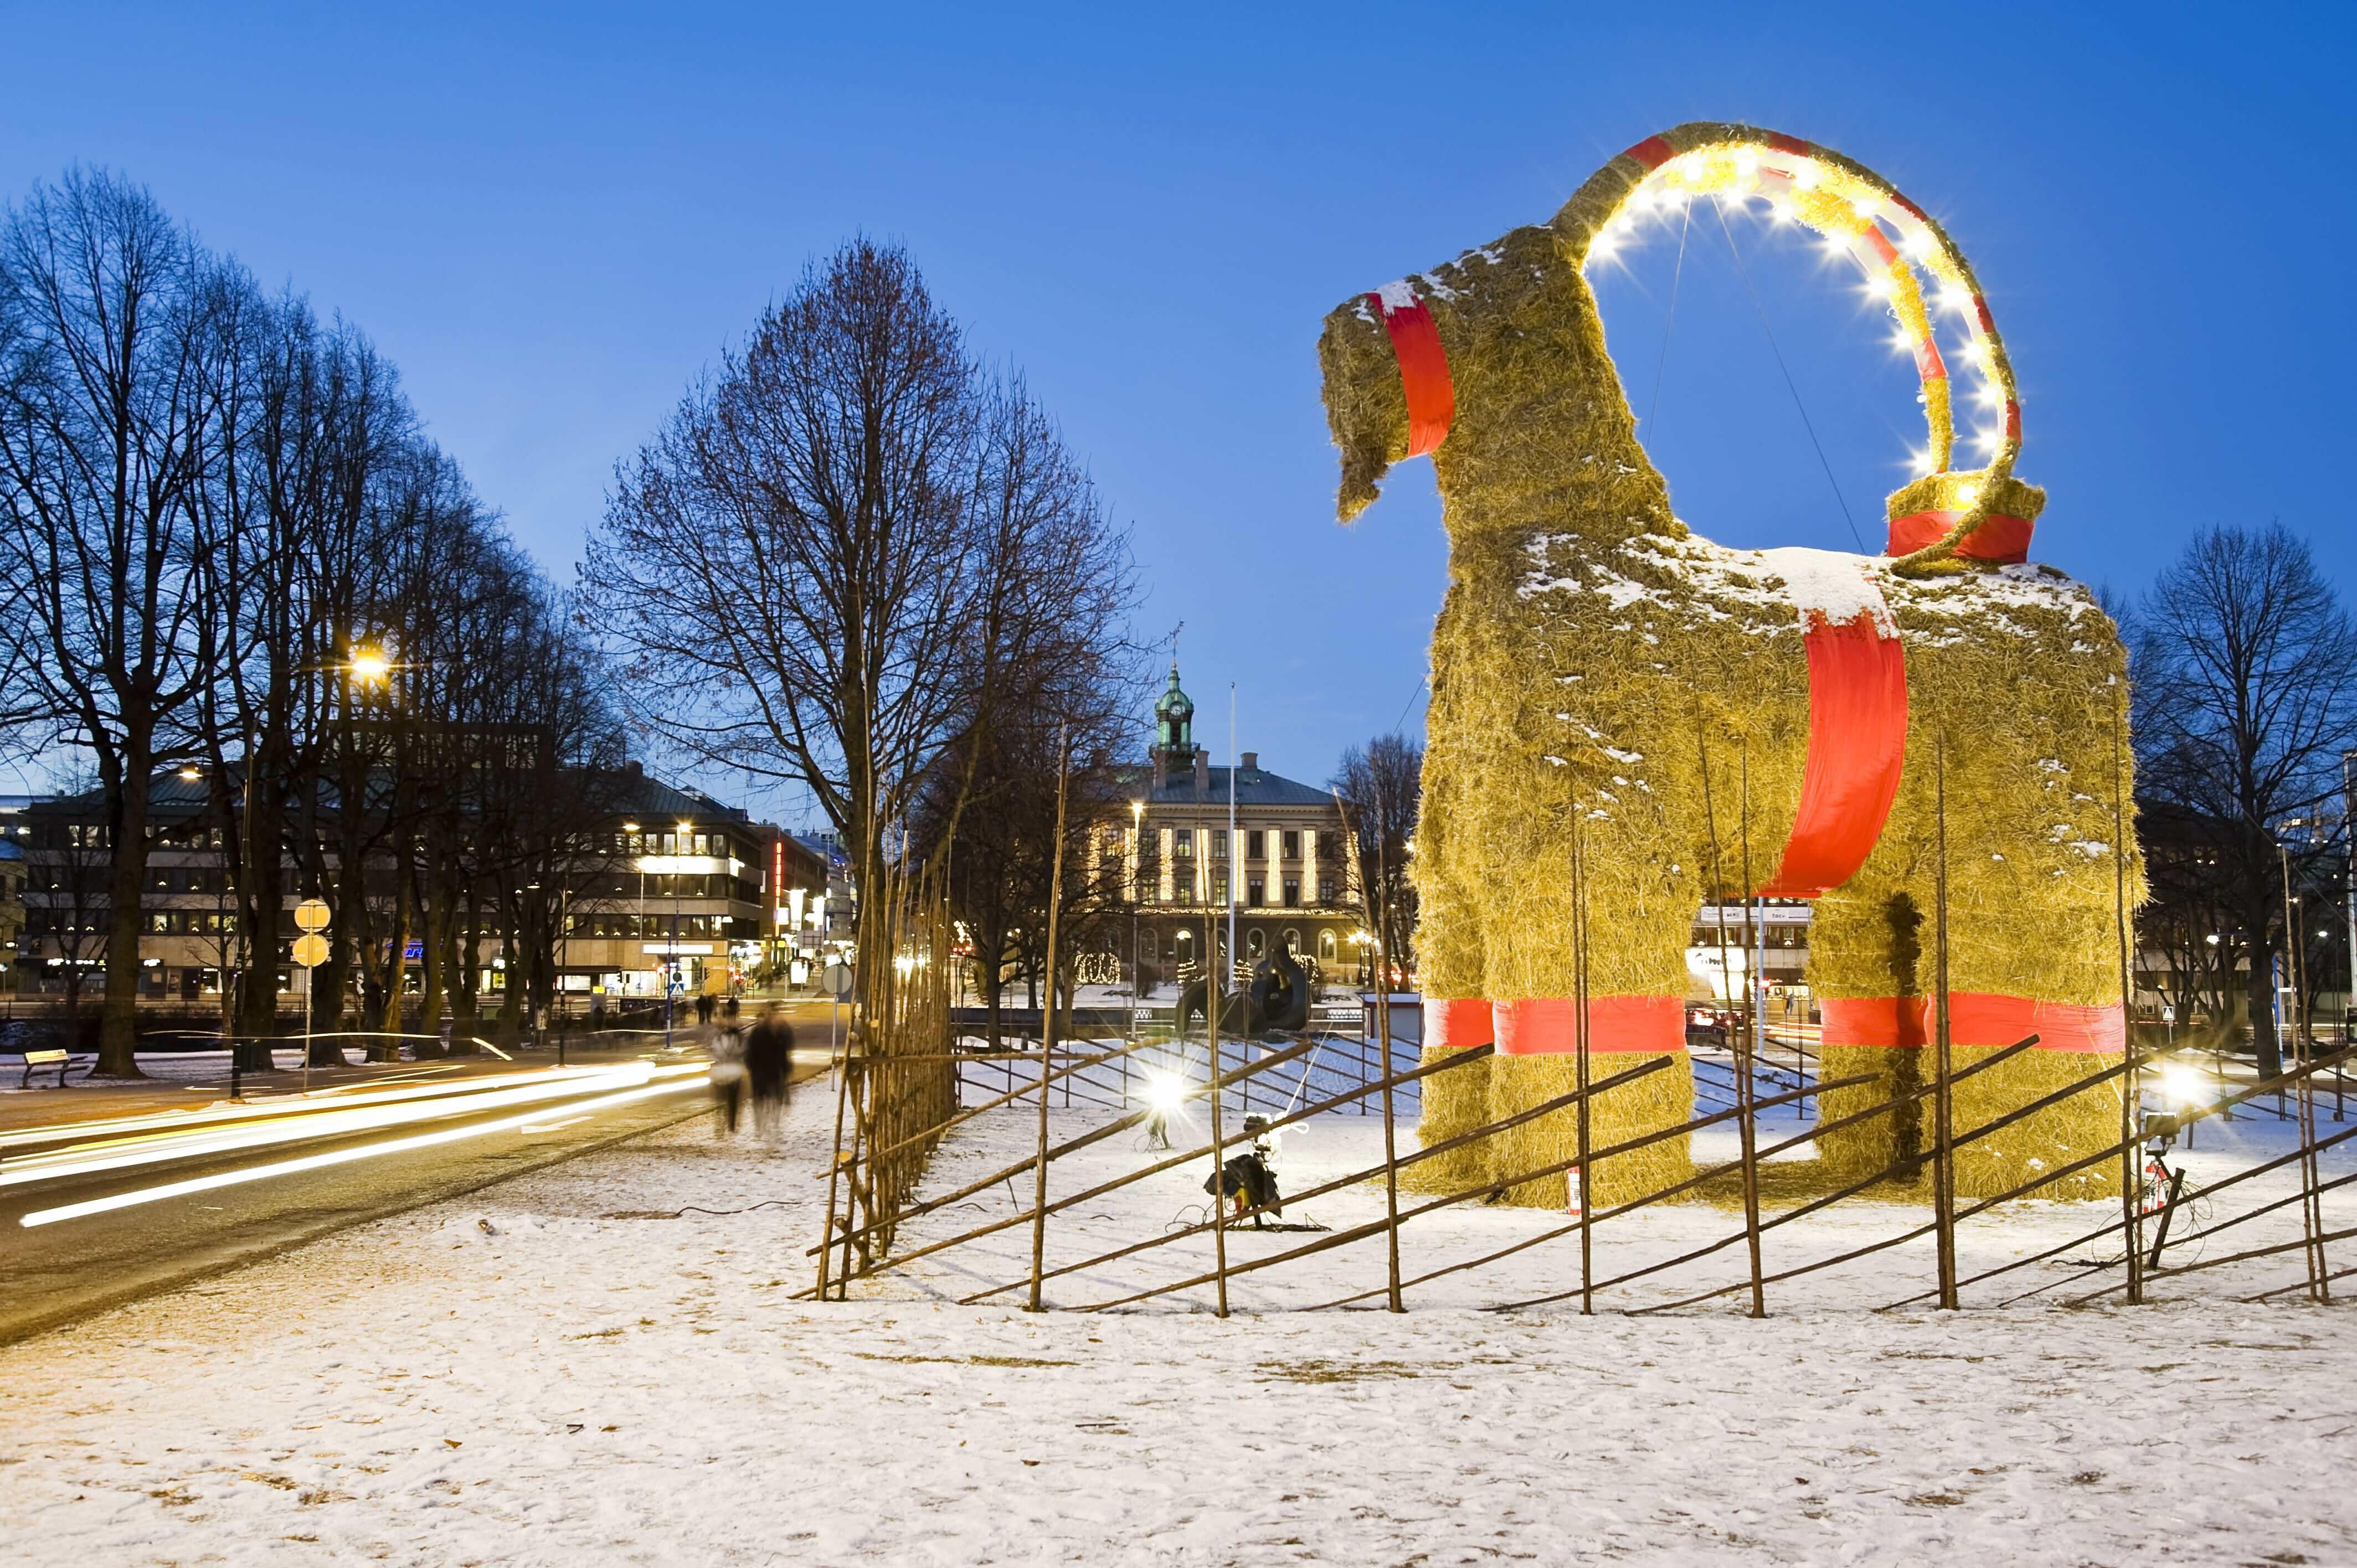 The Gävle Goat's Inauguration